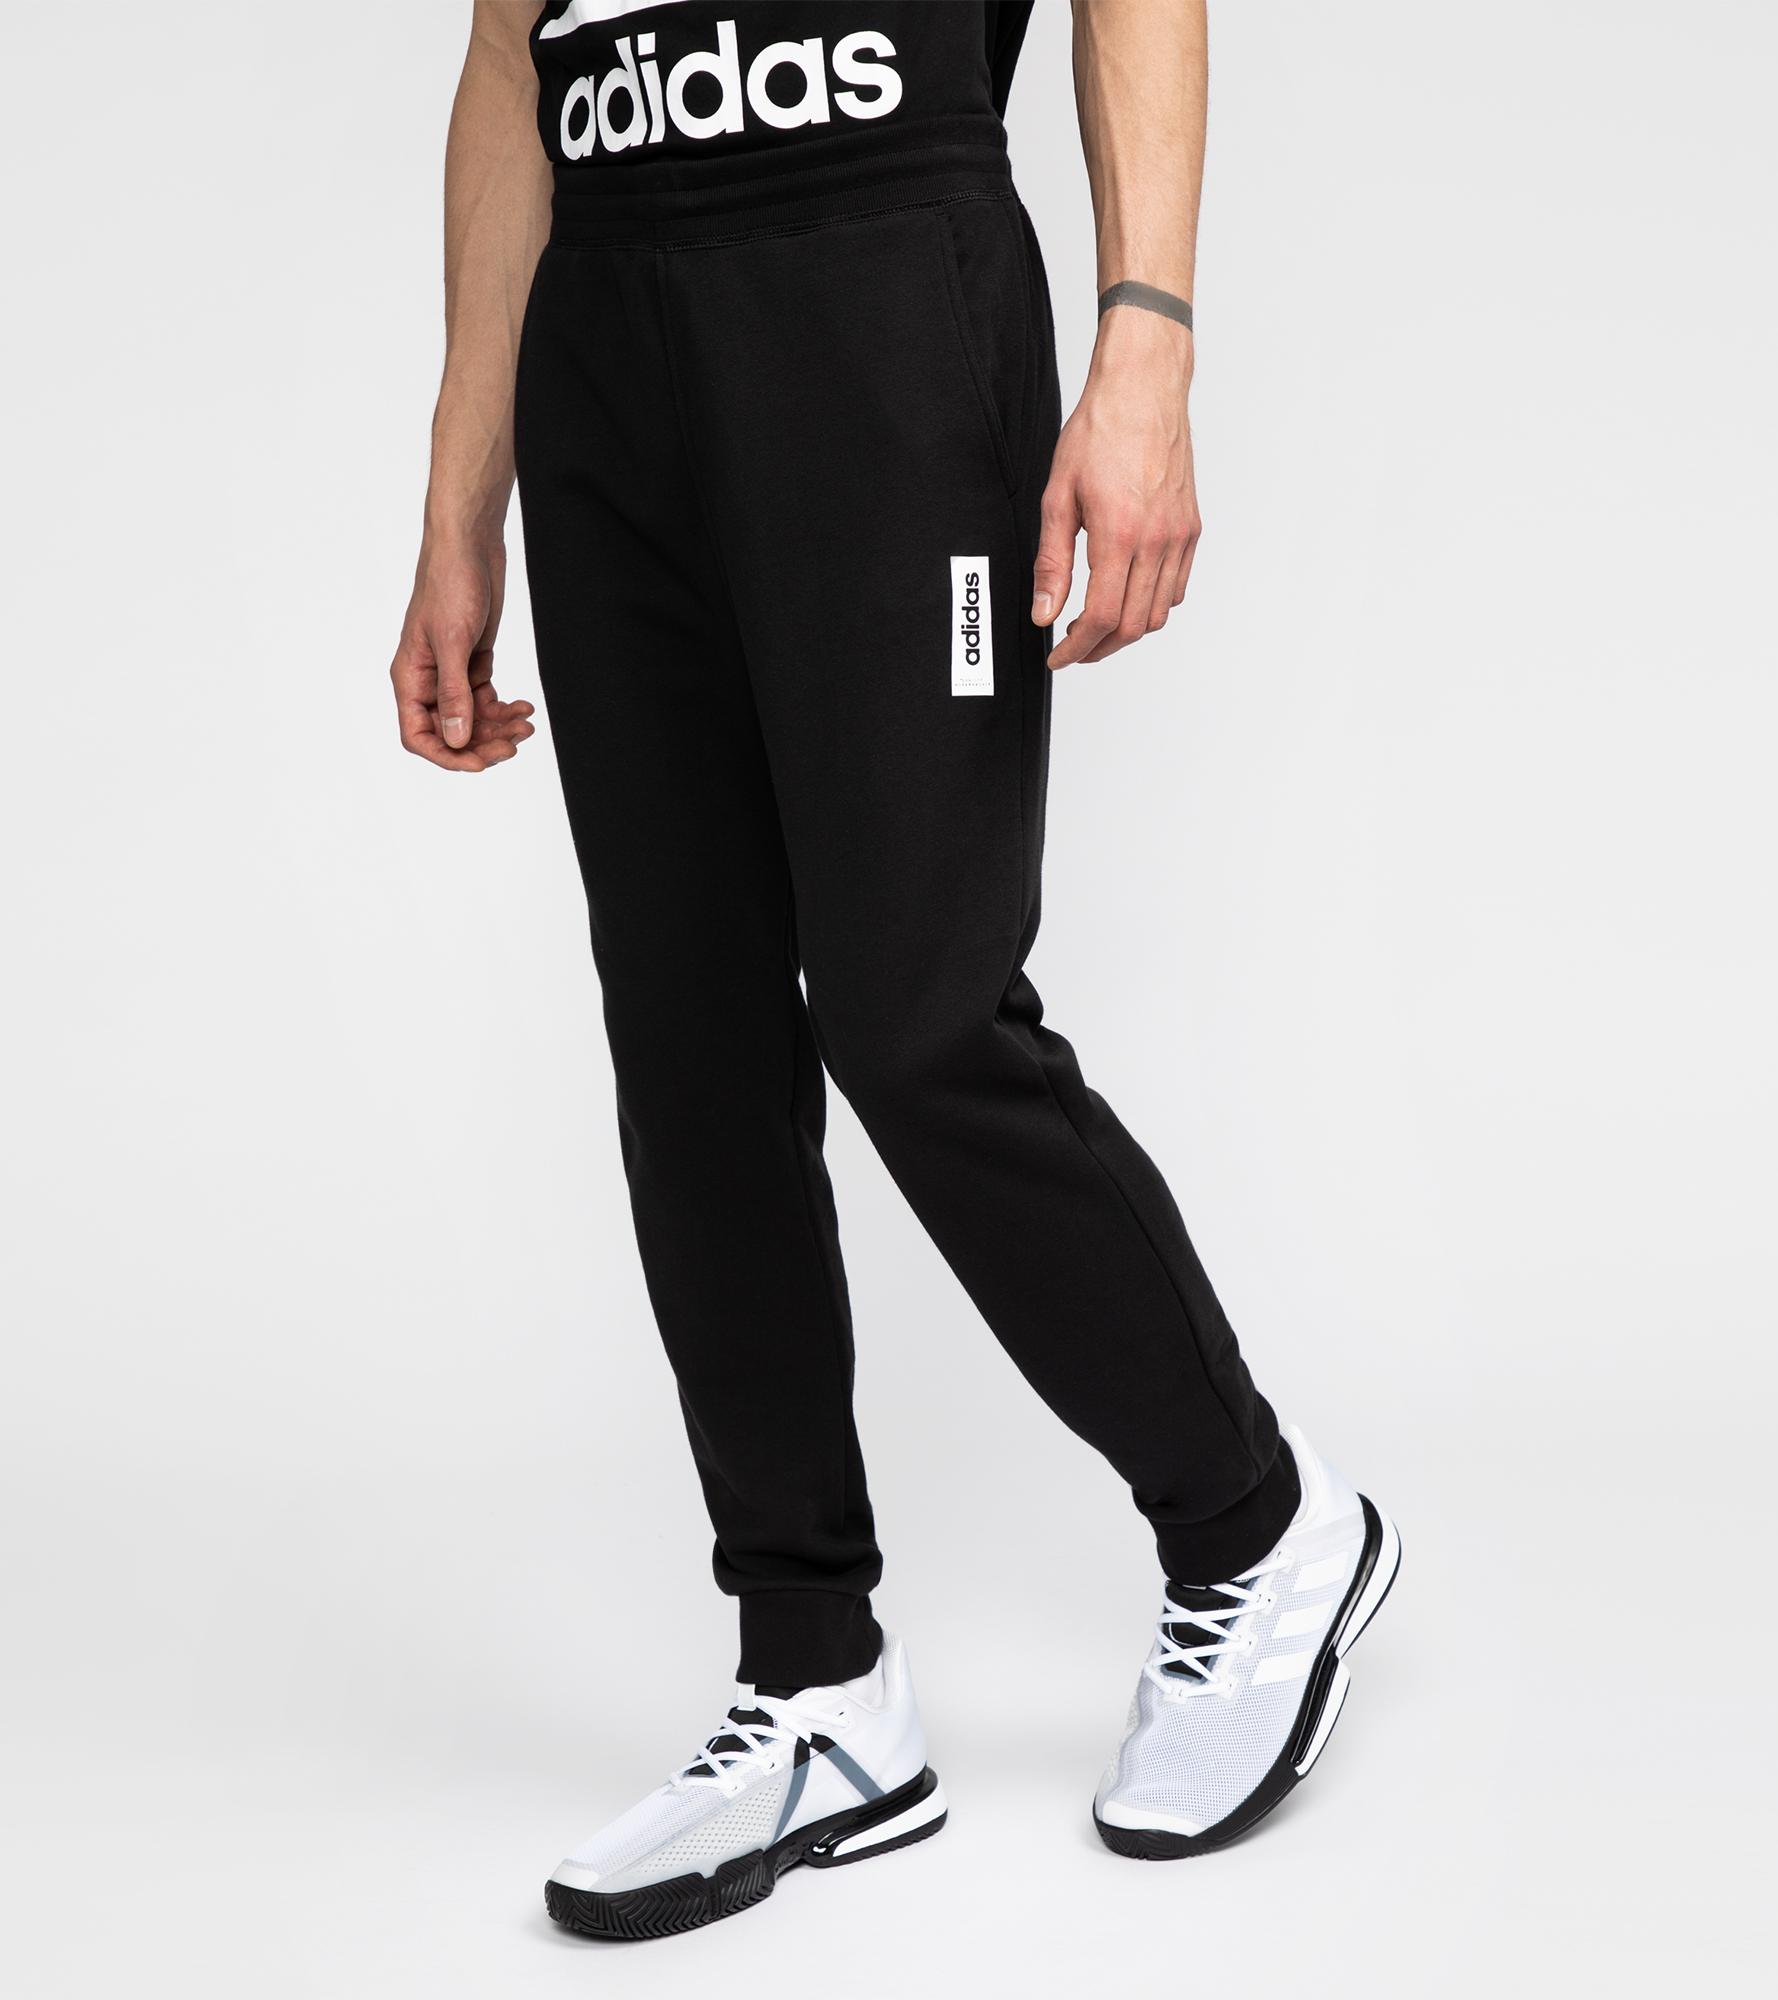 Adidas Брюки мужские Adidas Brilliant Basics, размер XL